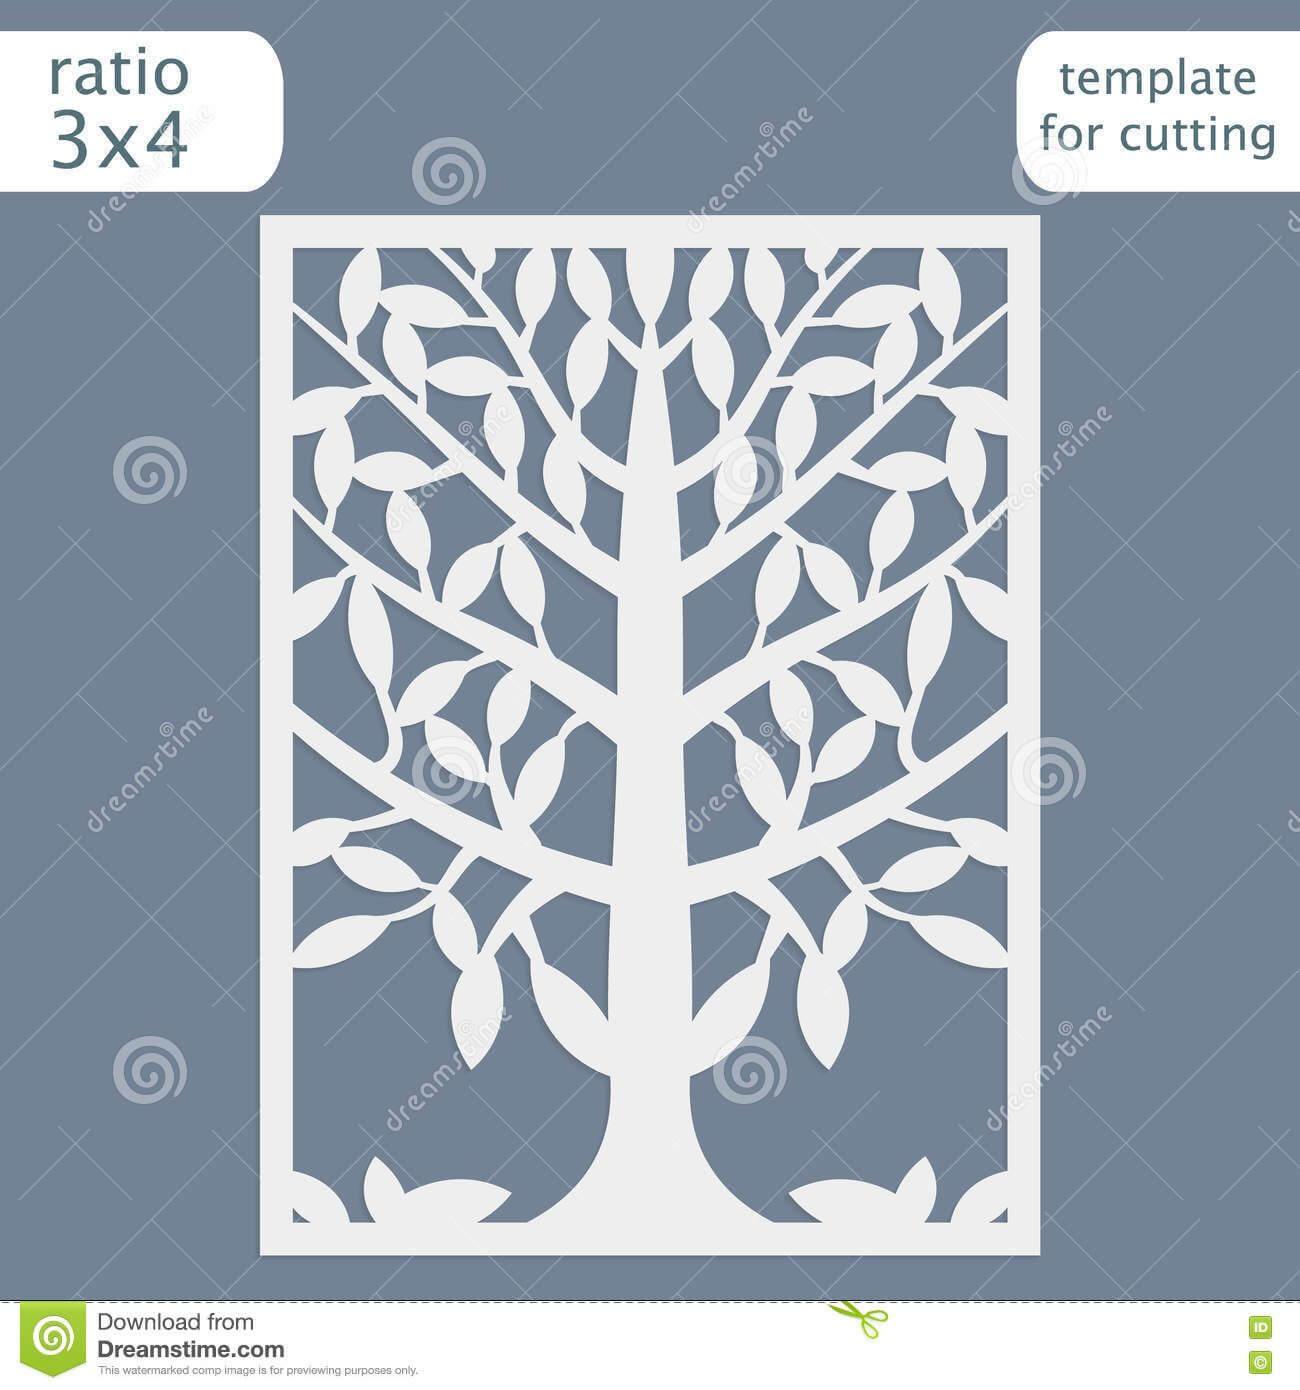 Free Svg Greeting Card Templates - Yahoo Image Search With Regard To Free Svg Card Templates